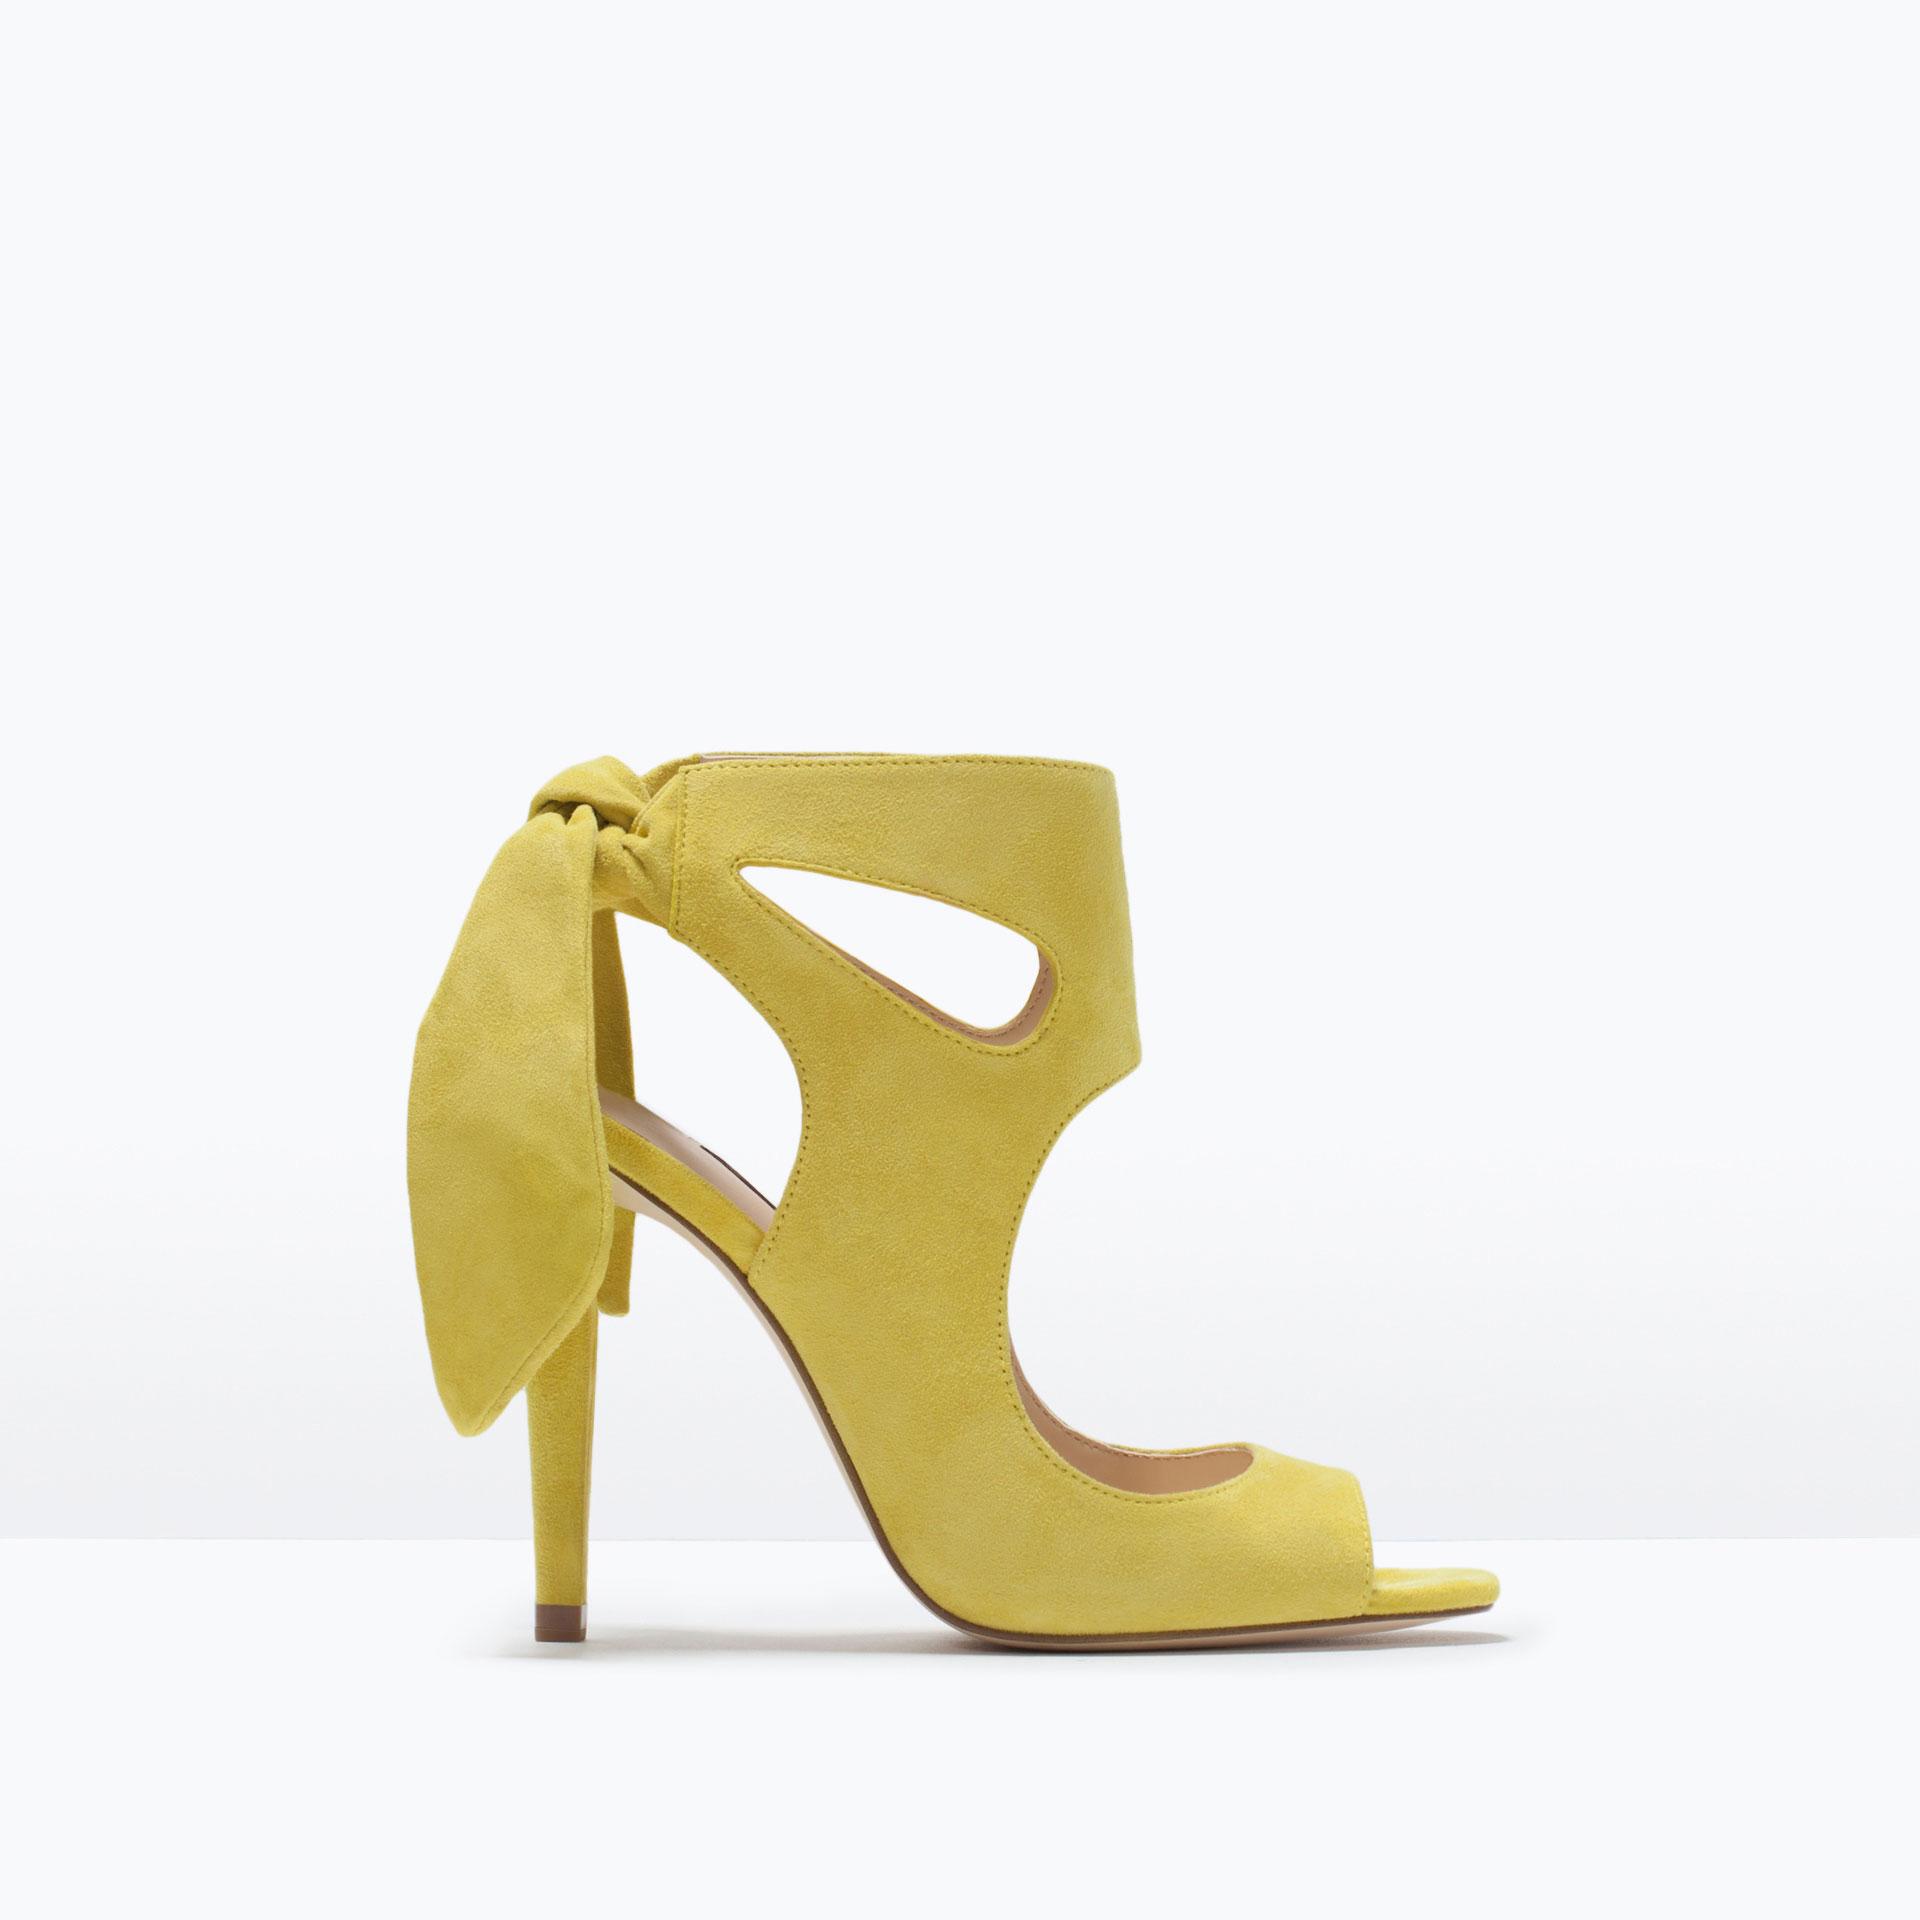 miglior servizio 18671 fdfc3 zara sandali gialli - Shoeplay Fashion blog di scarpe da donna